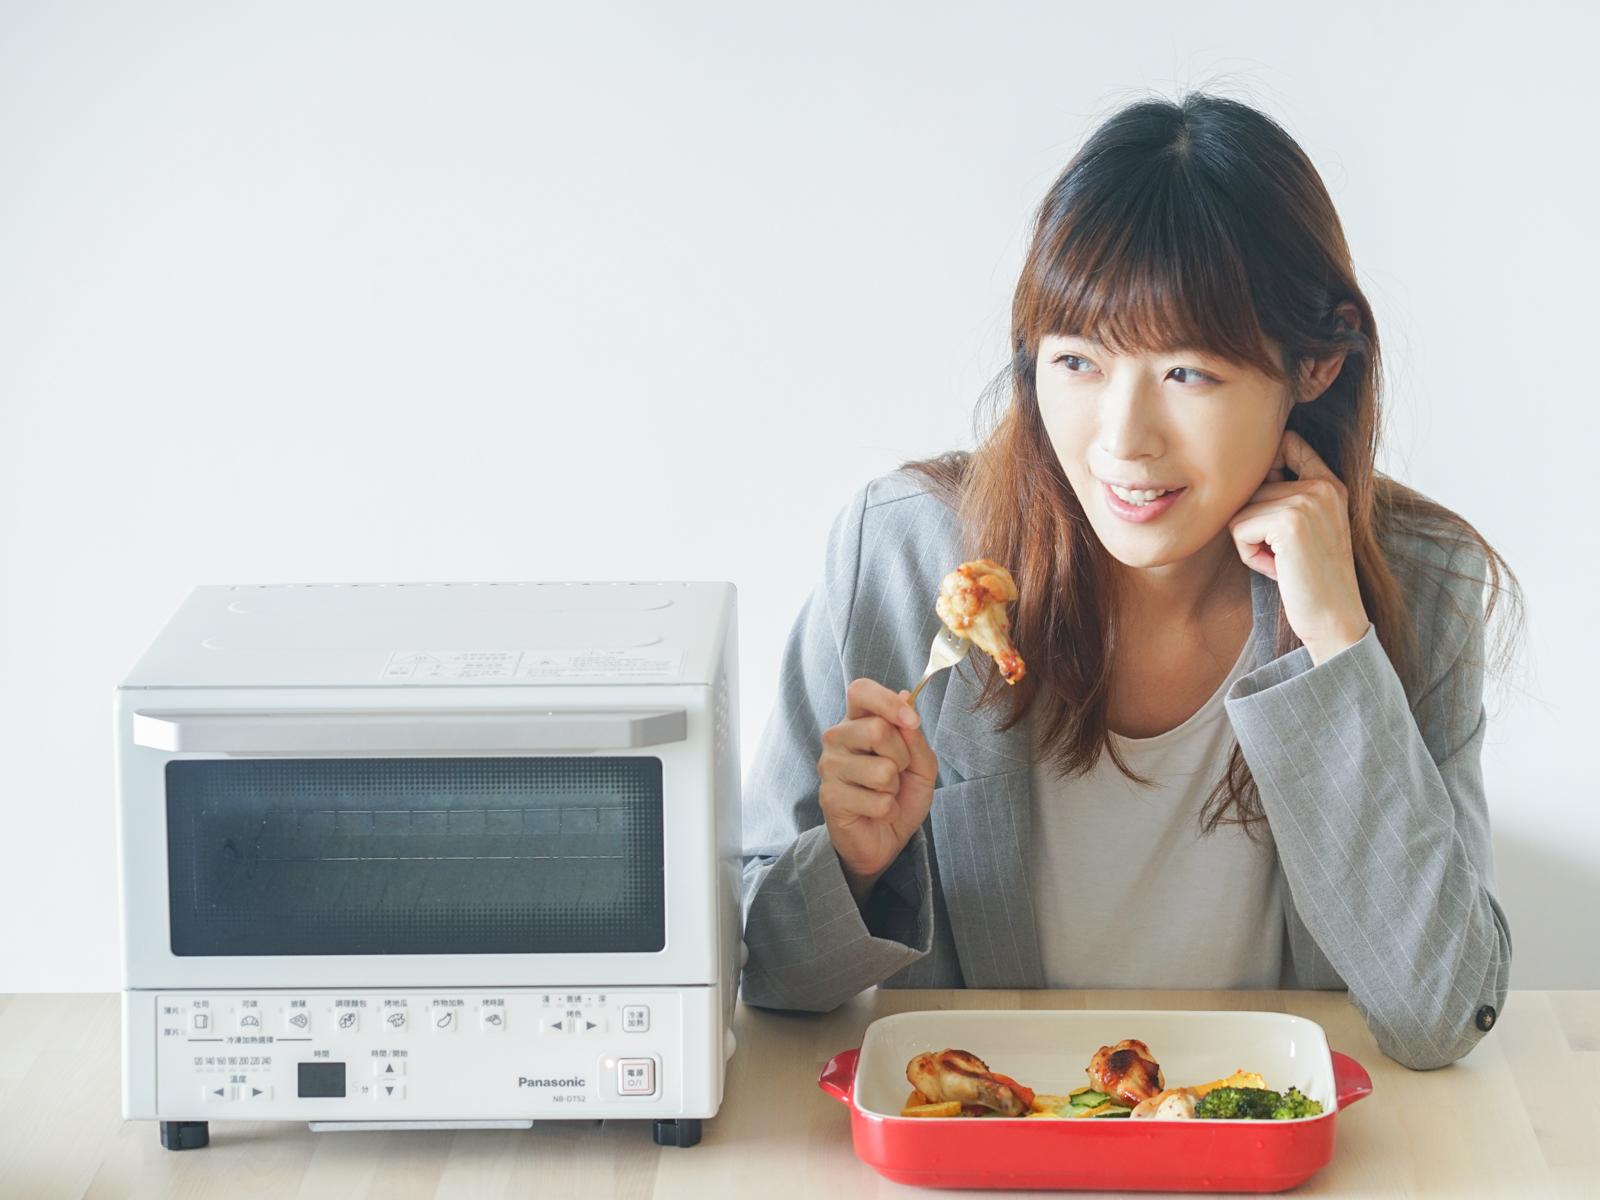 Panasonic 日本超人氣智能烤箱 NB-DT52 輕鬆享受剛出爐的美味